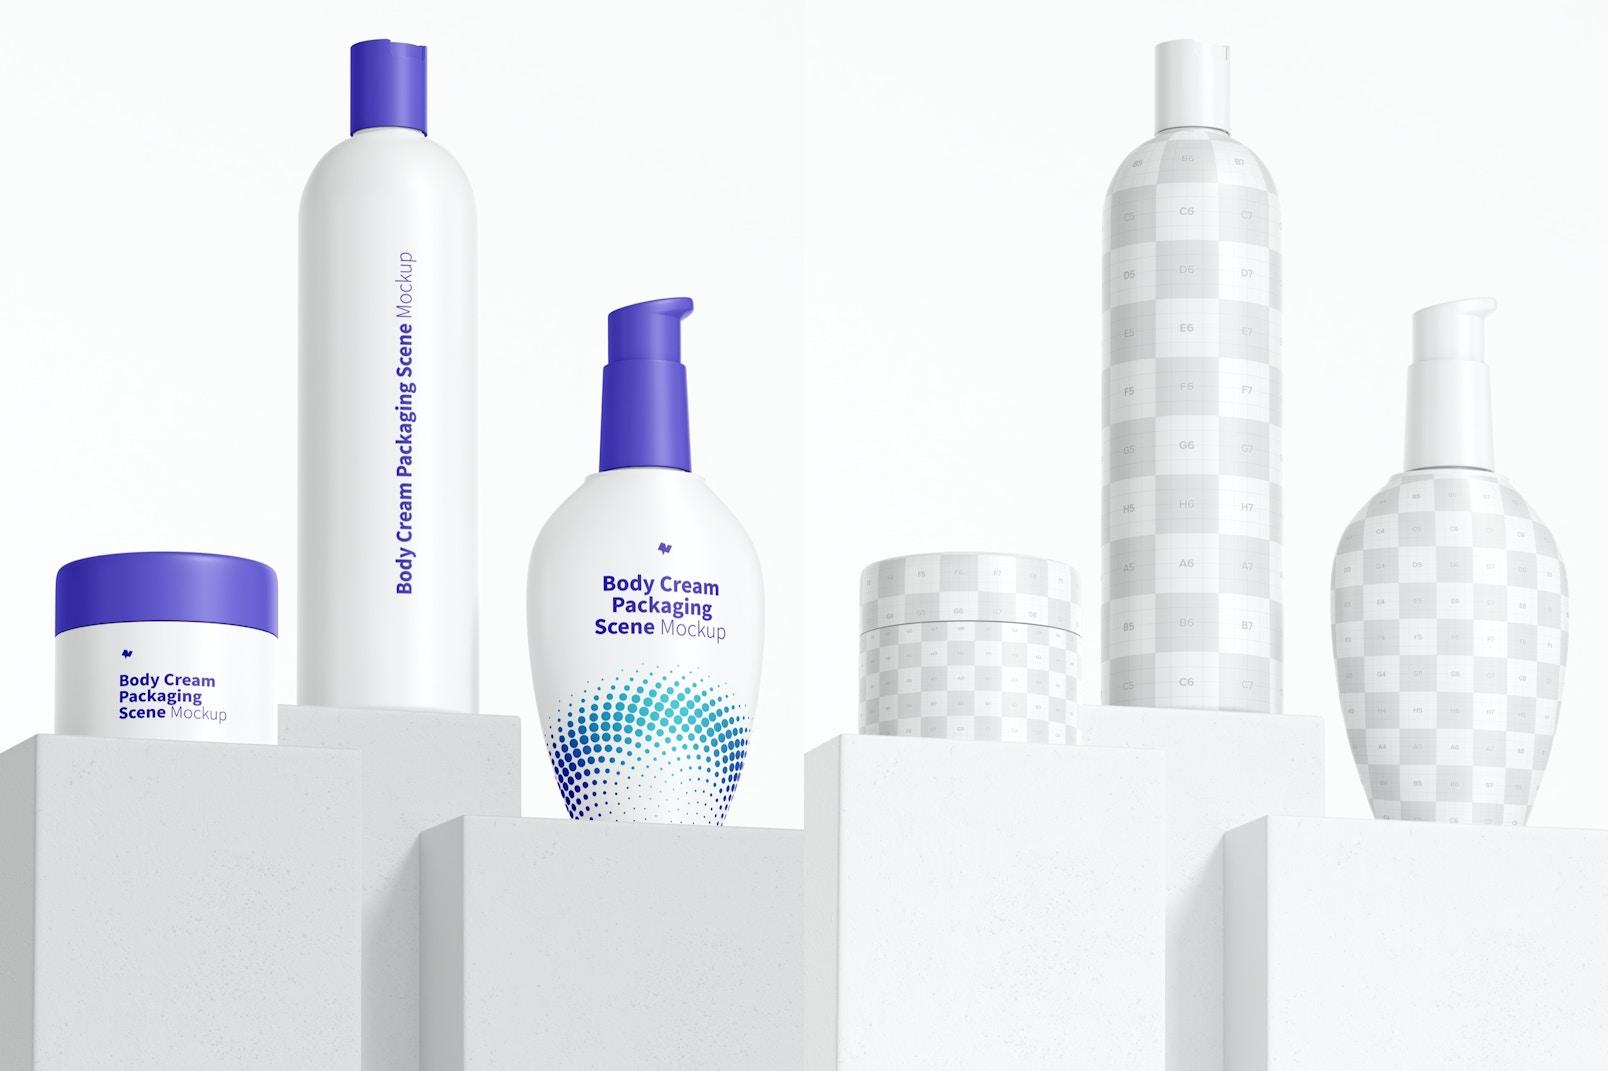 Body Cream Packaging Scenes Mockup